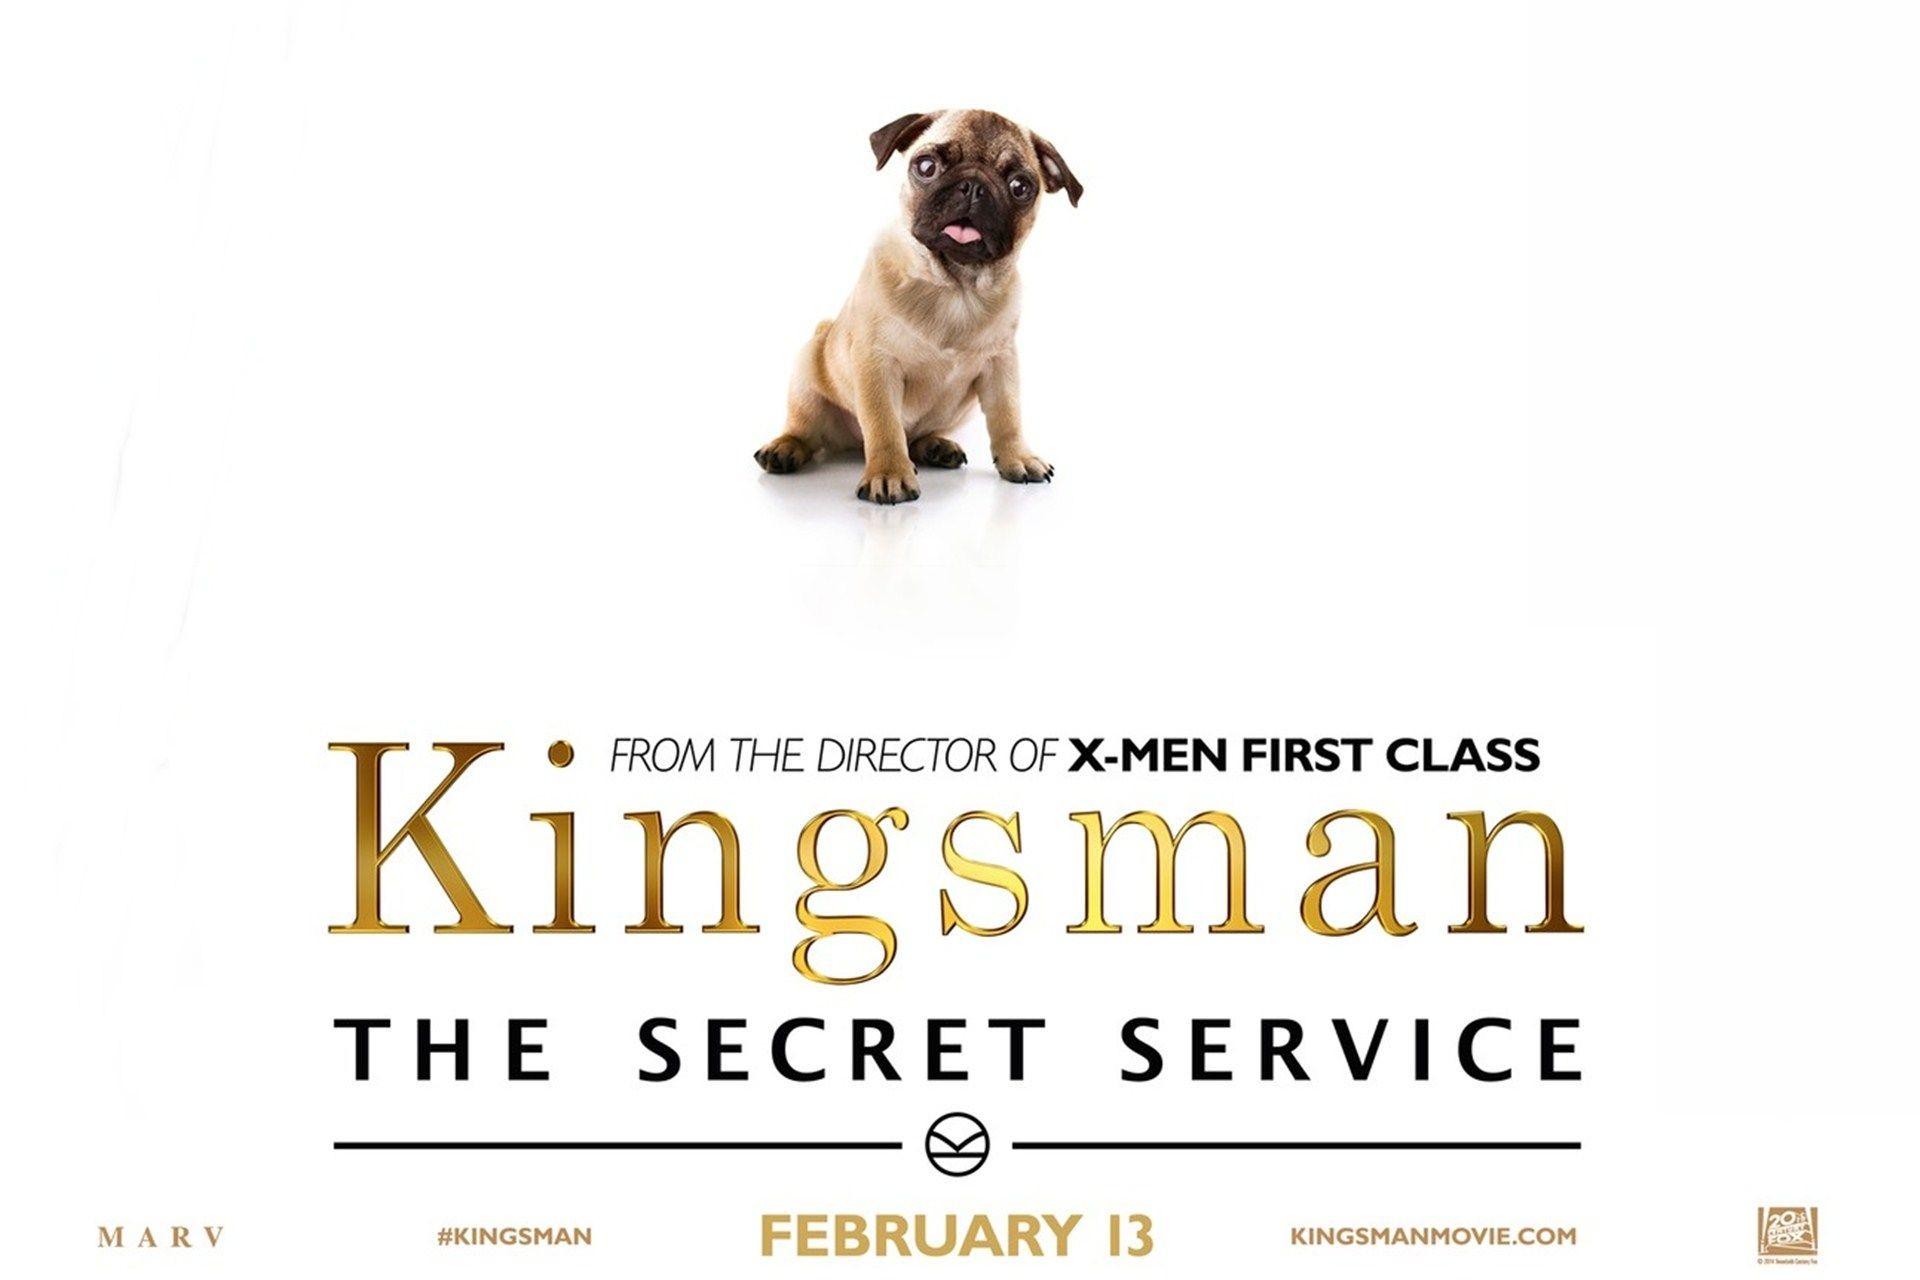 Res: 1920x1280, Kingsman The Secret Service (2015) - Puppy Solo - Wallpaper 006 - Click to